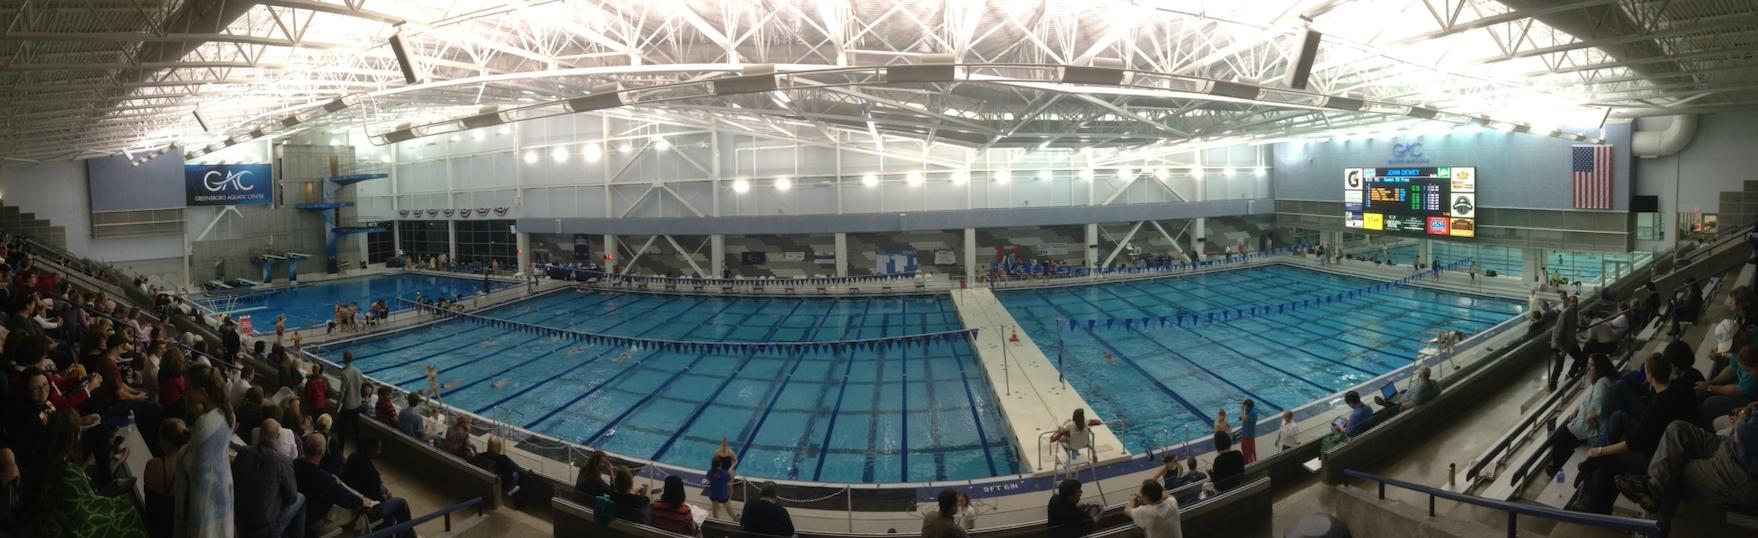 GAC, greensboro aquatic center, long course pool, olympic size pool